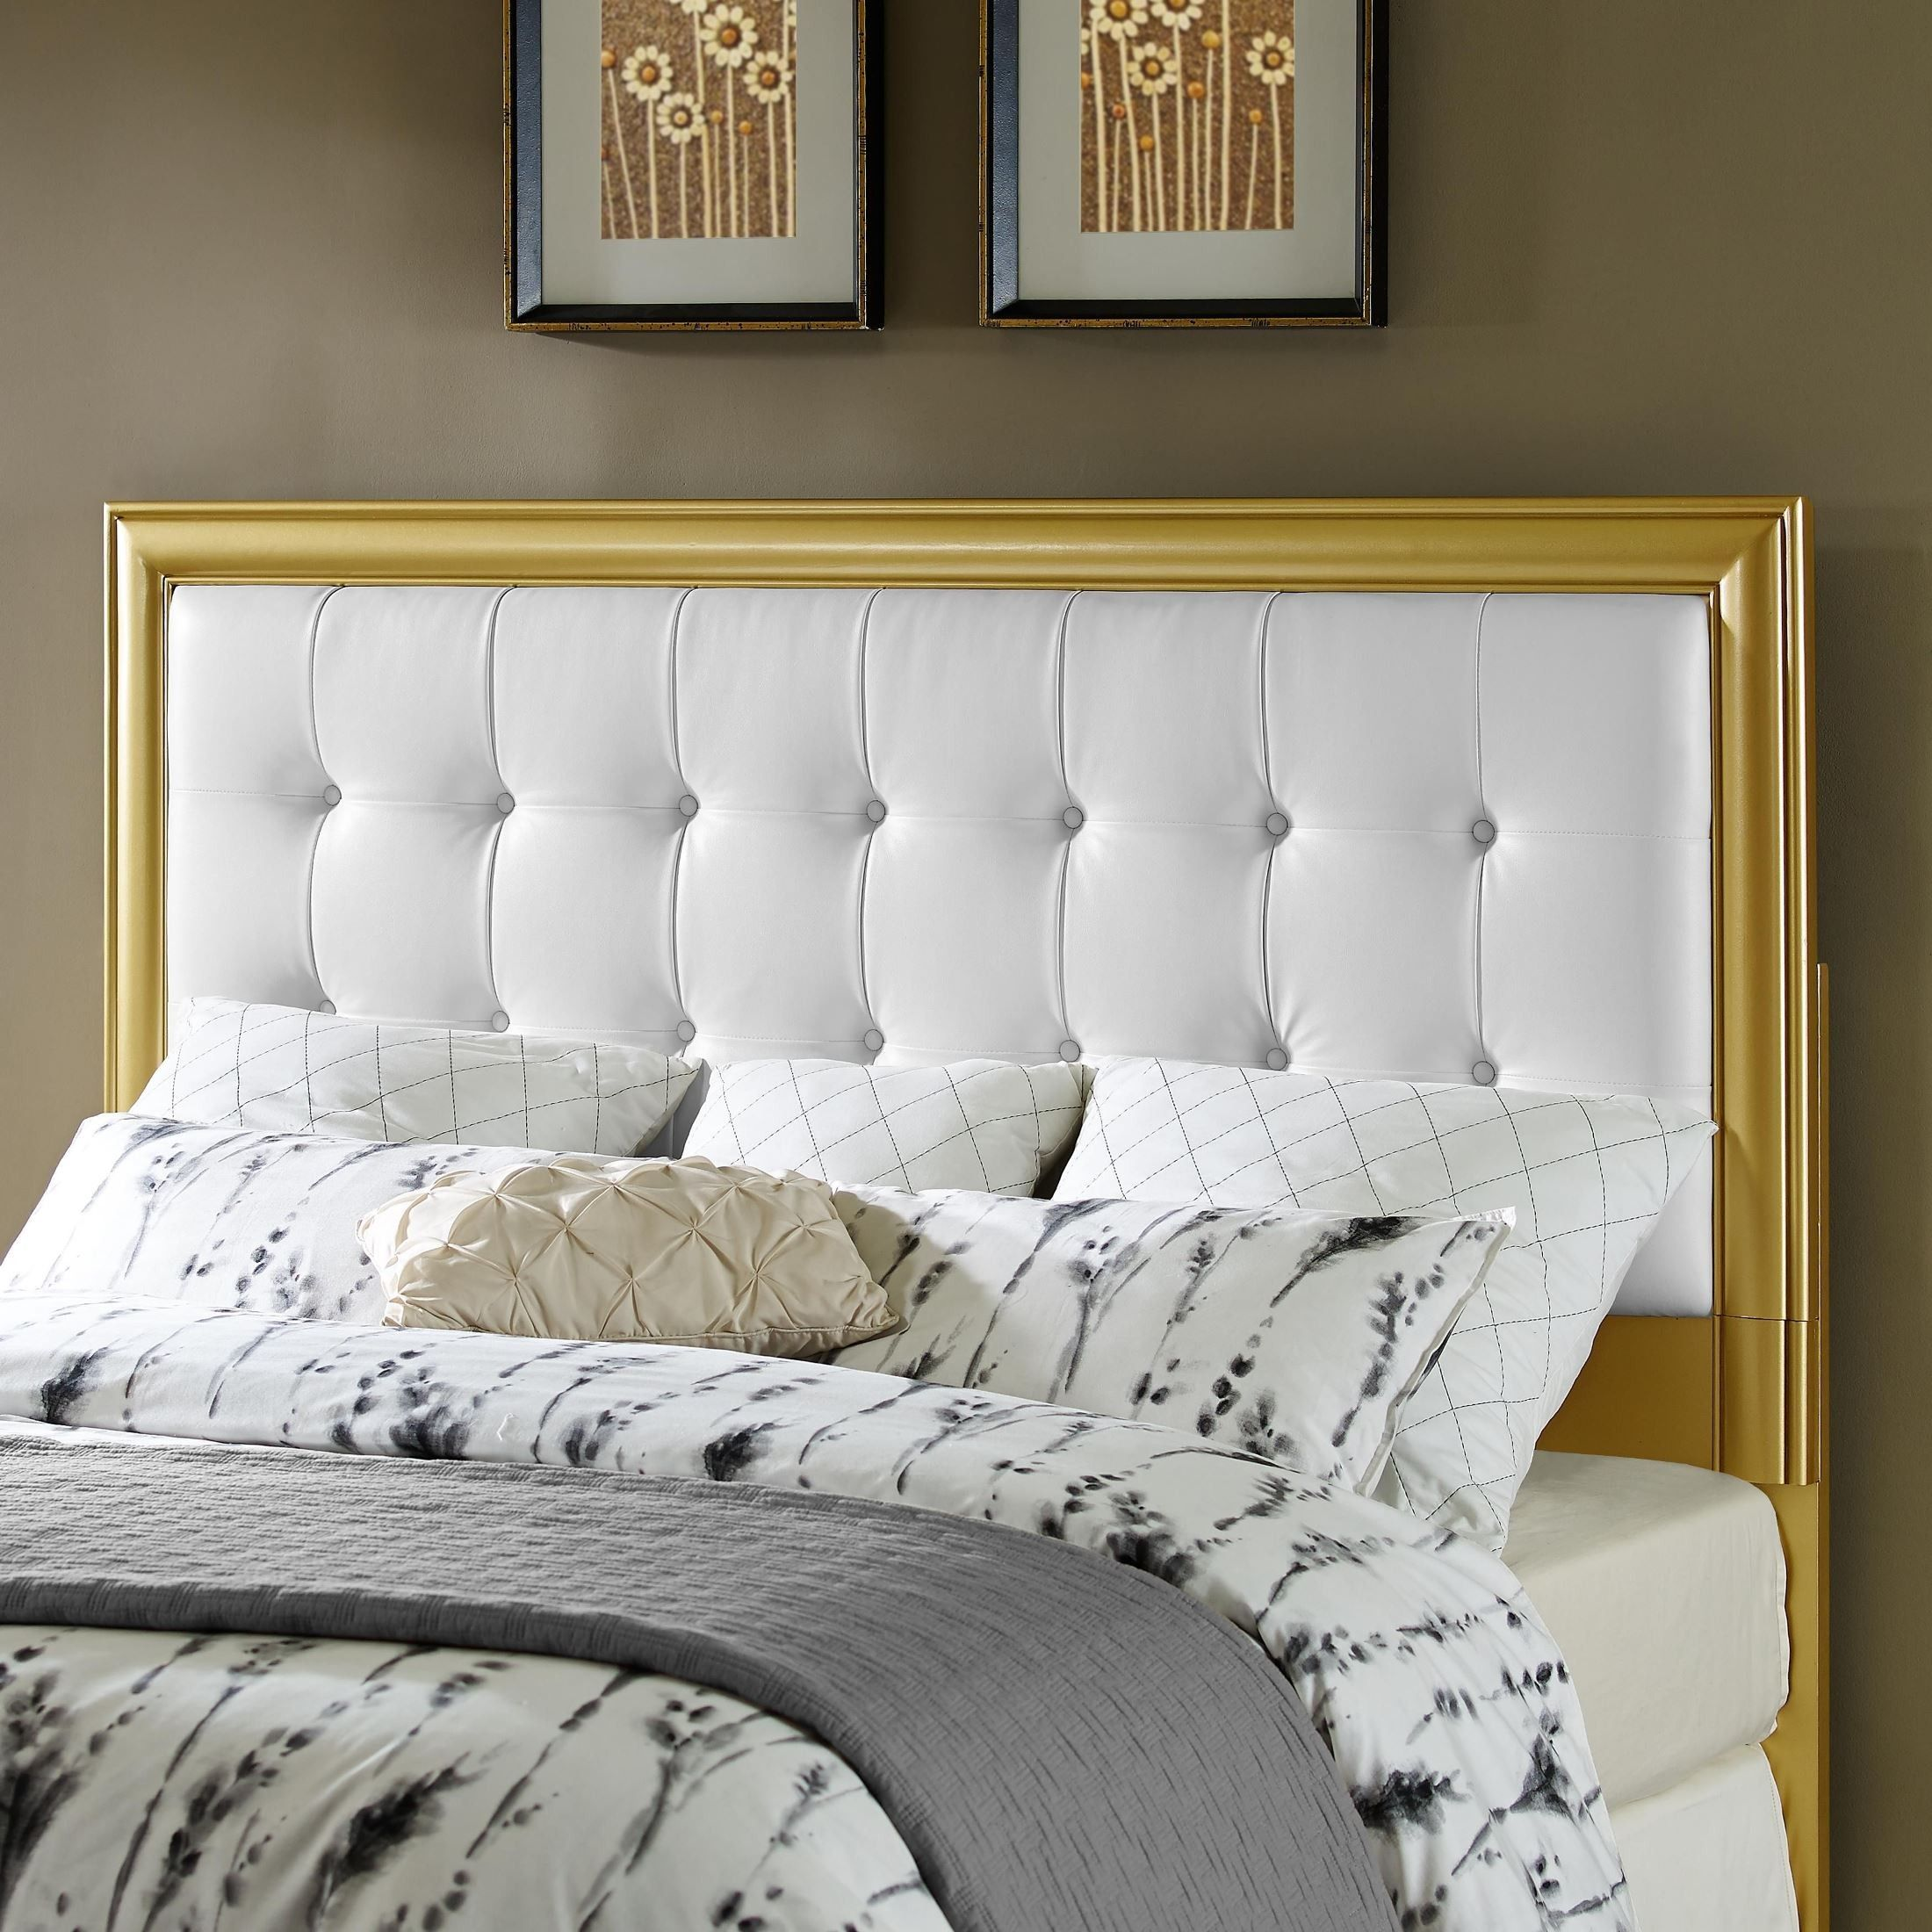 King Cal King Gold Frame Upholstered Headboard White Upholstered Headboard Upholstered Headboard Headboard